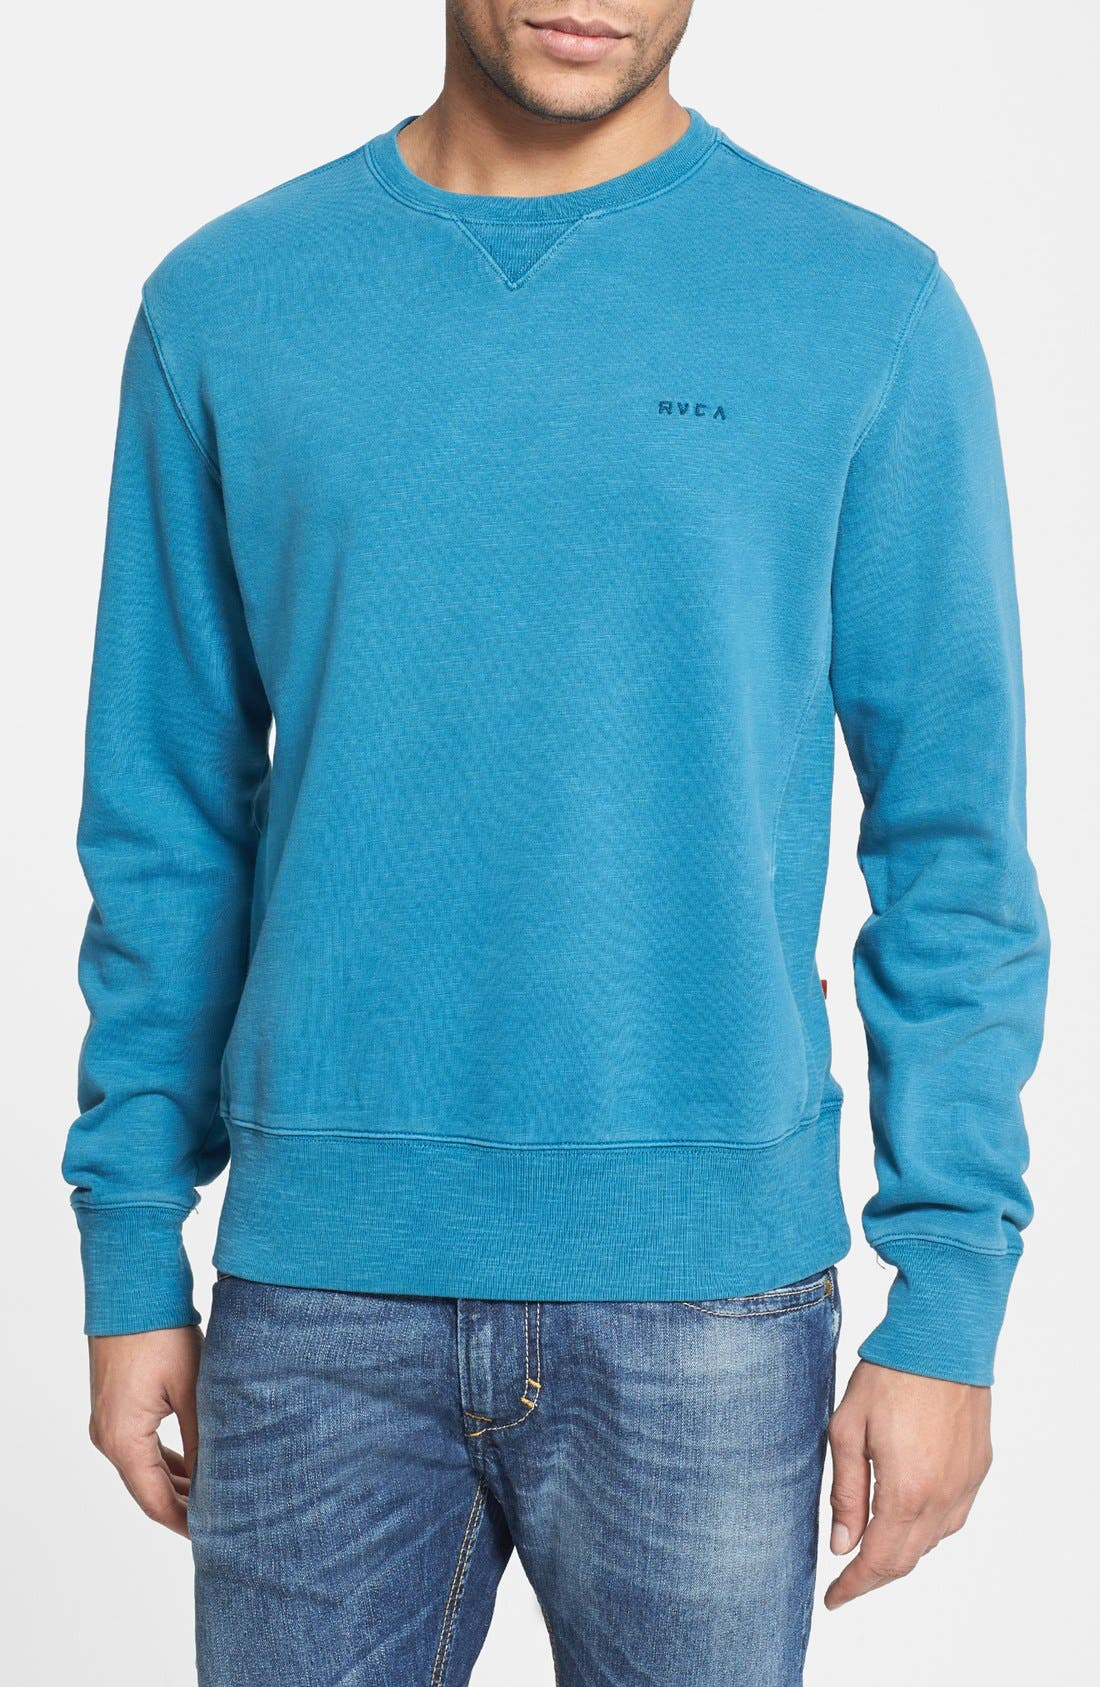 Alternate Image 1 Selected - RVCA 'Desert Sun' Crewneck Sweatshirt